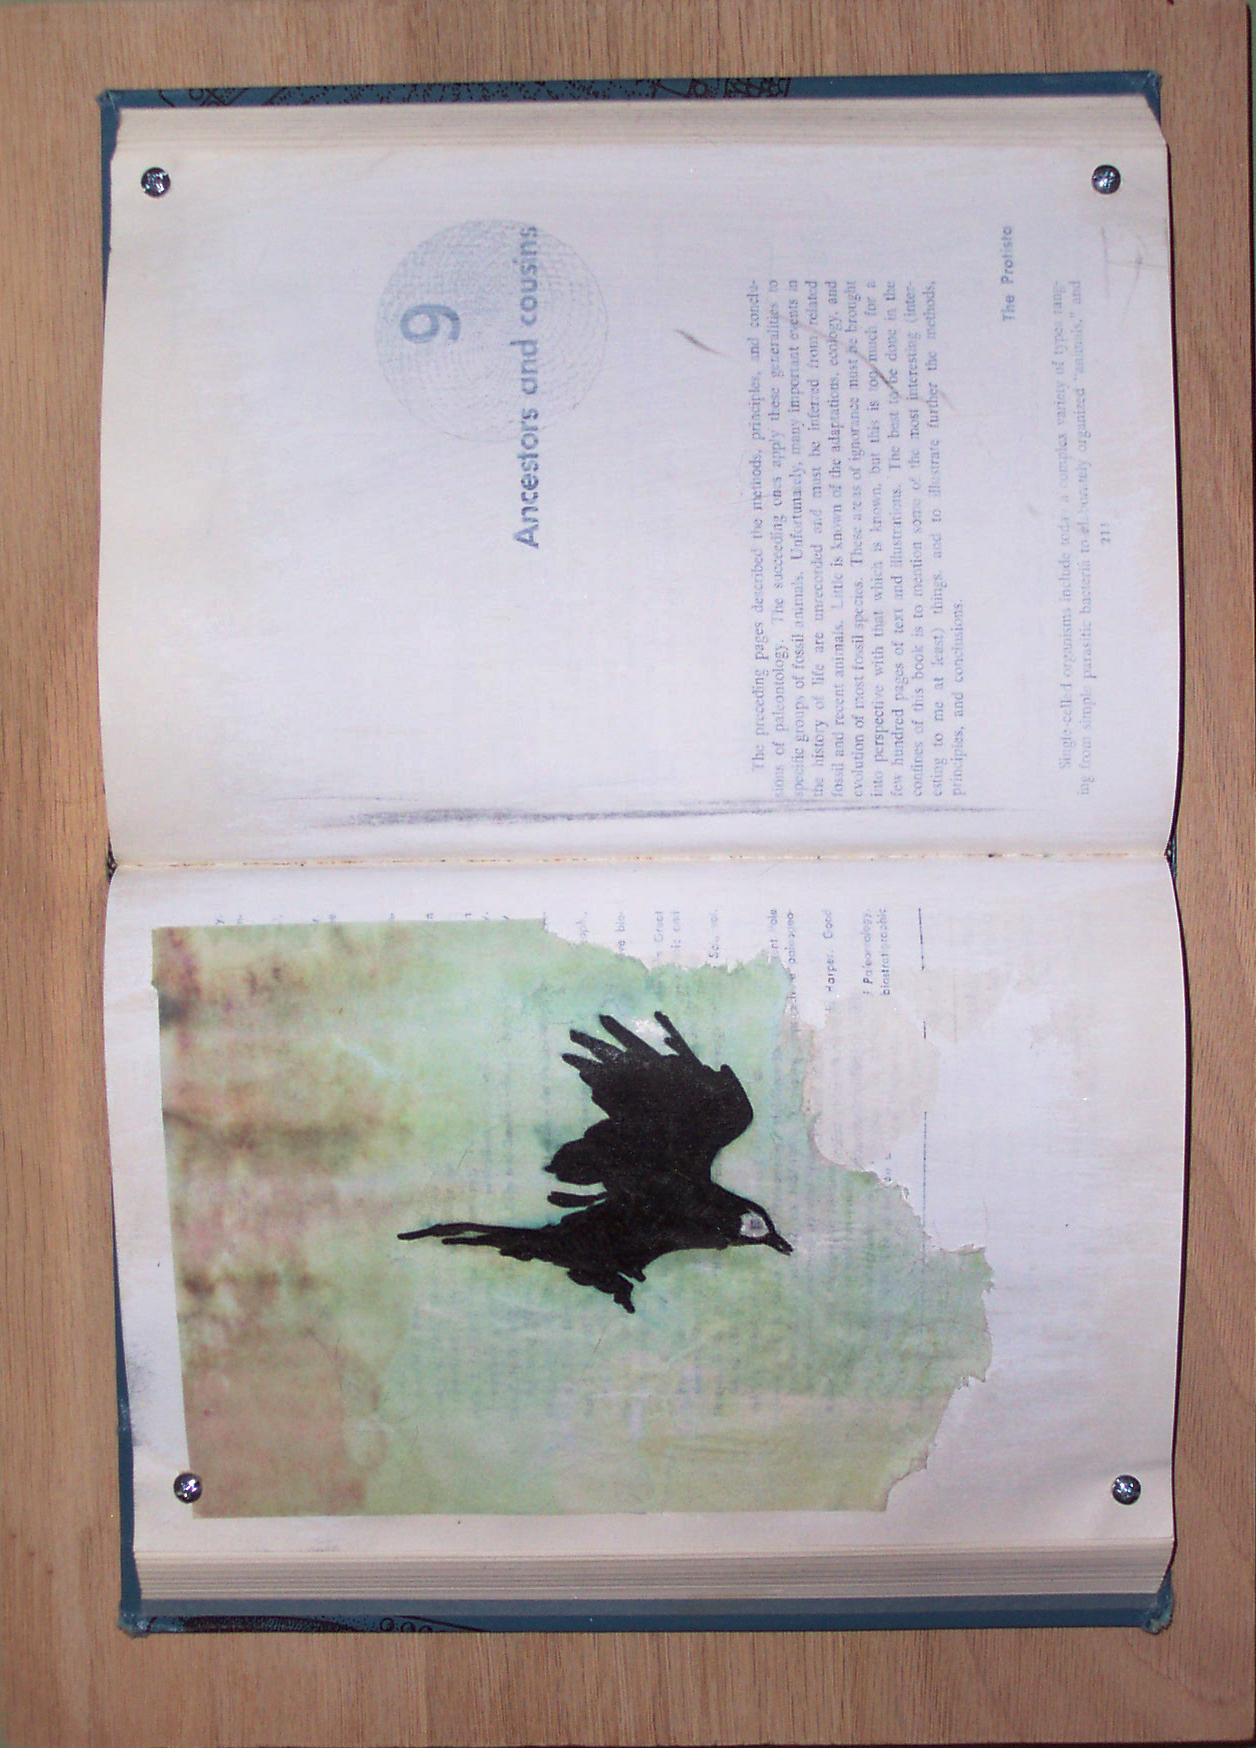 As the Crow Flies (pt. 2). 2008. Altered book, transfer print, ink illustration, gesso, screws, oak. -